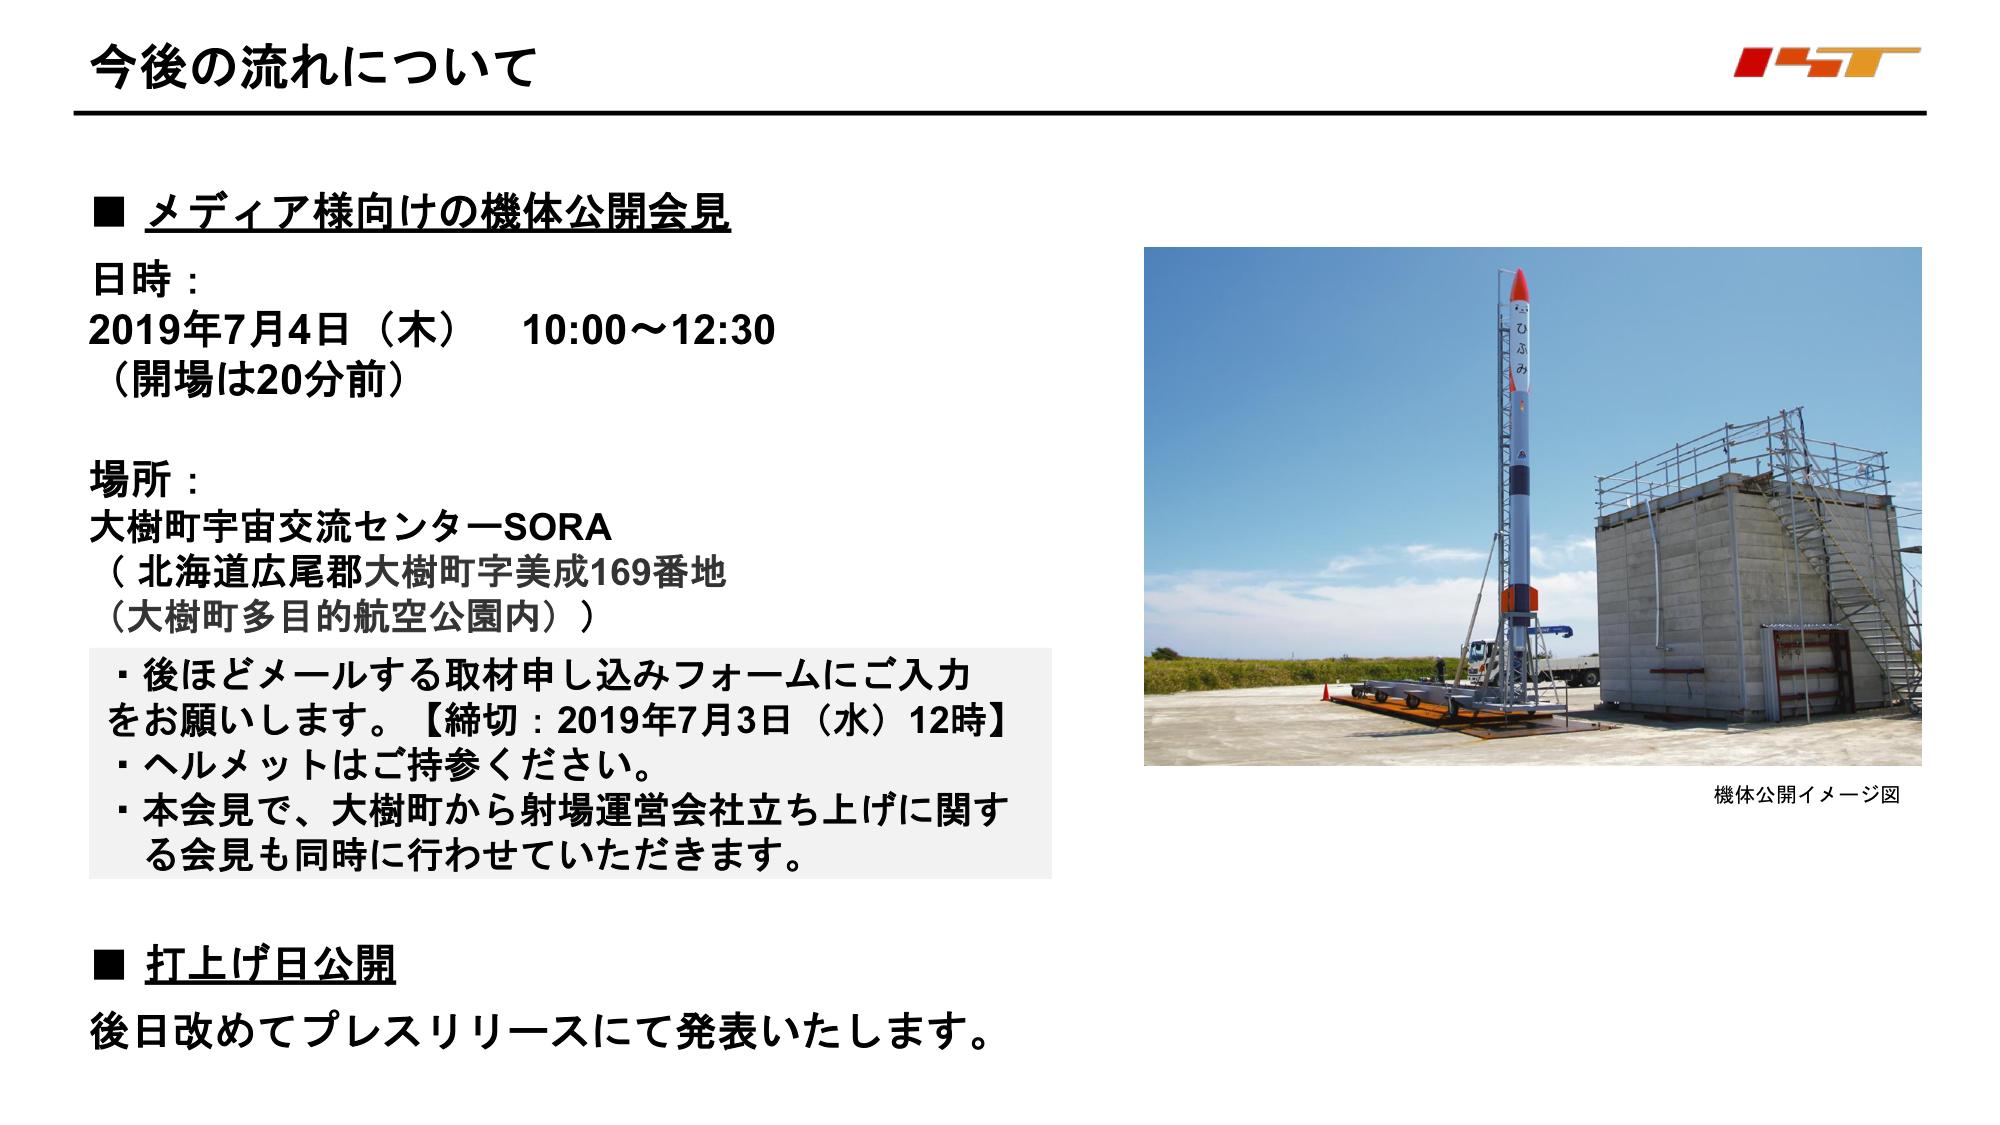 f:id:Imamura:20190628161405p:plain